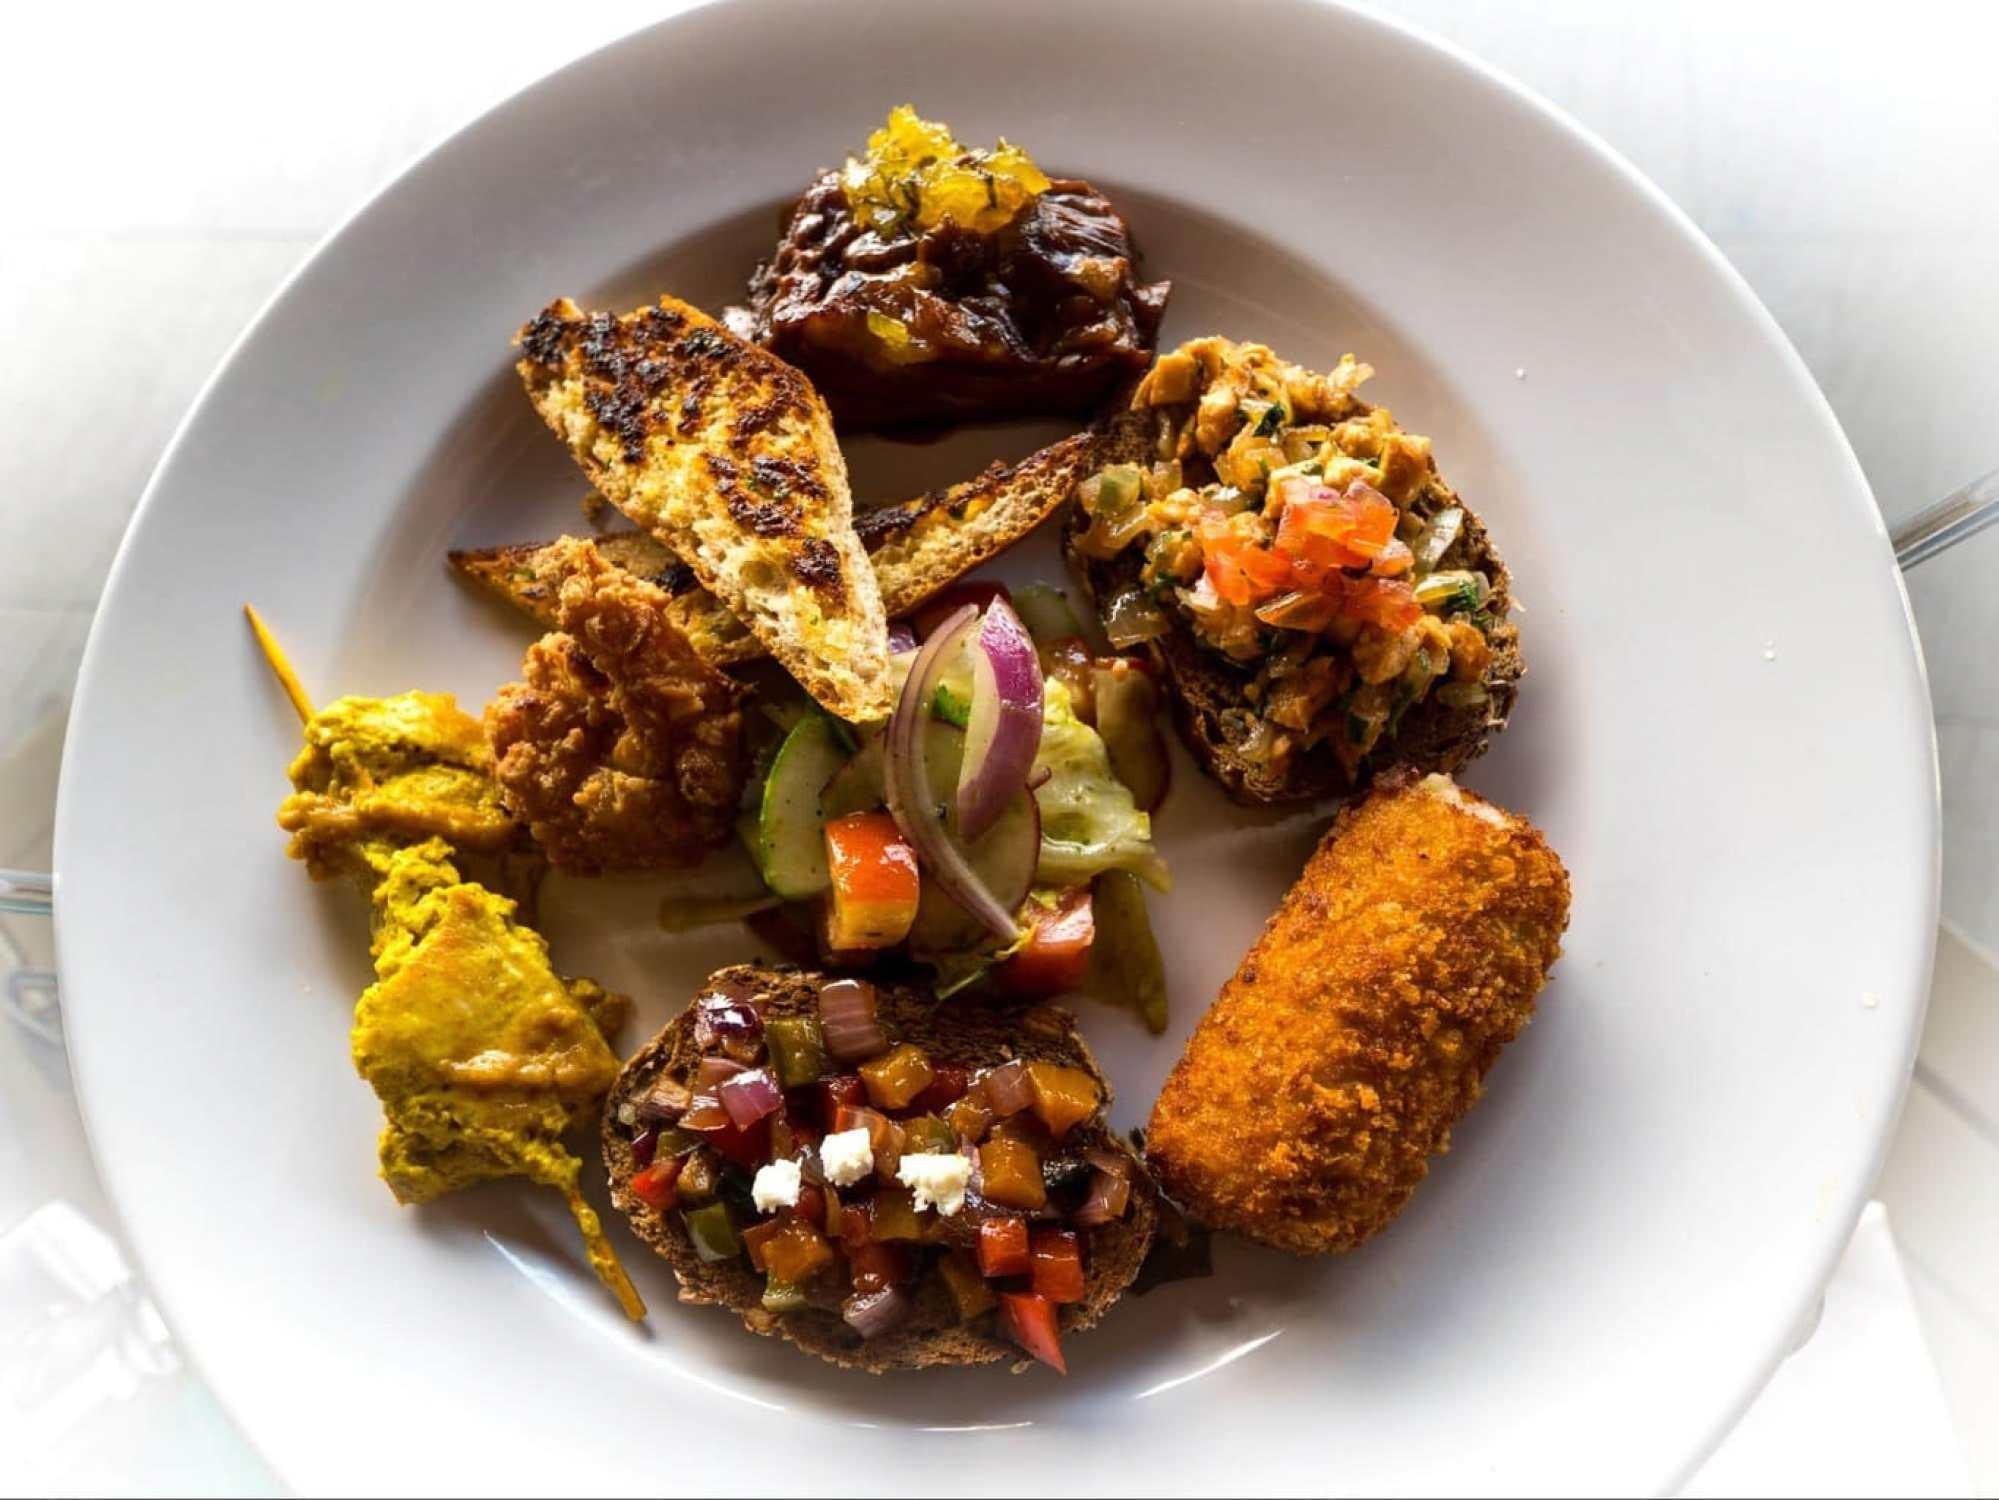 Tapas lunch at Vahavu Bistrot